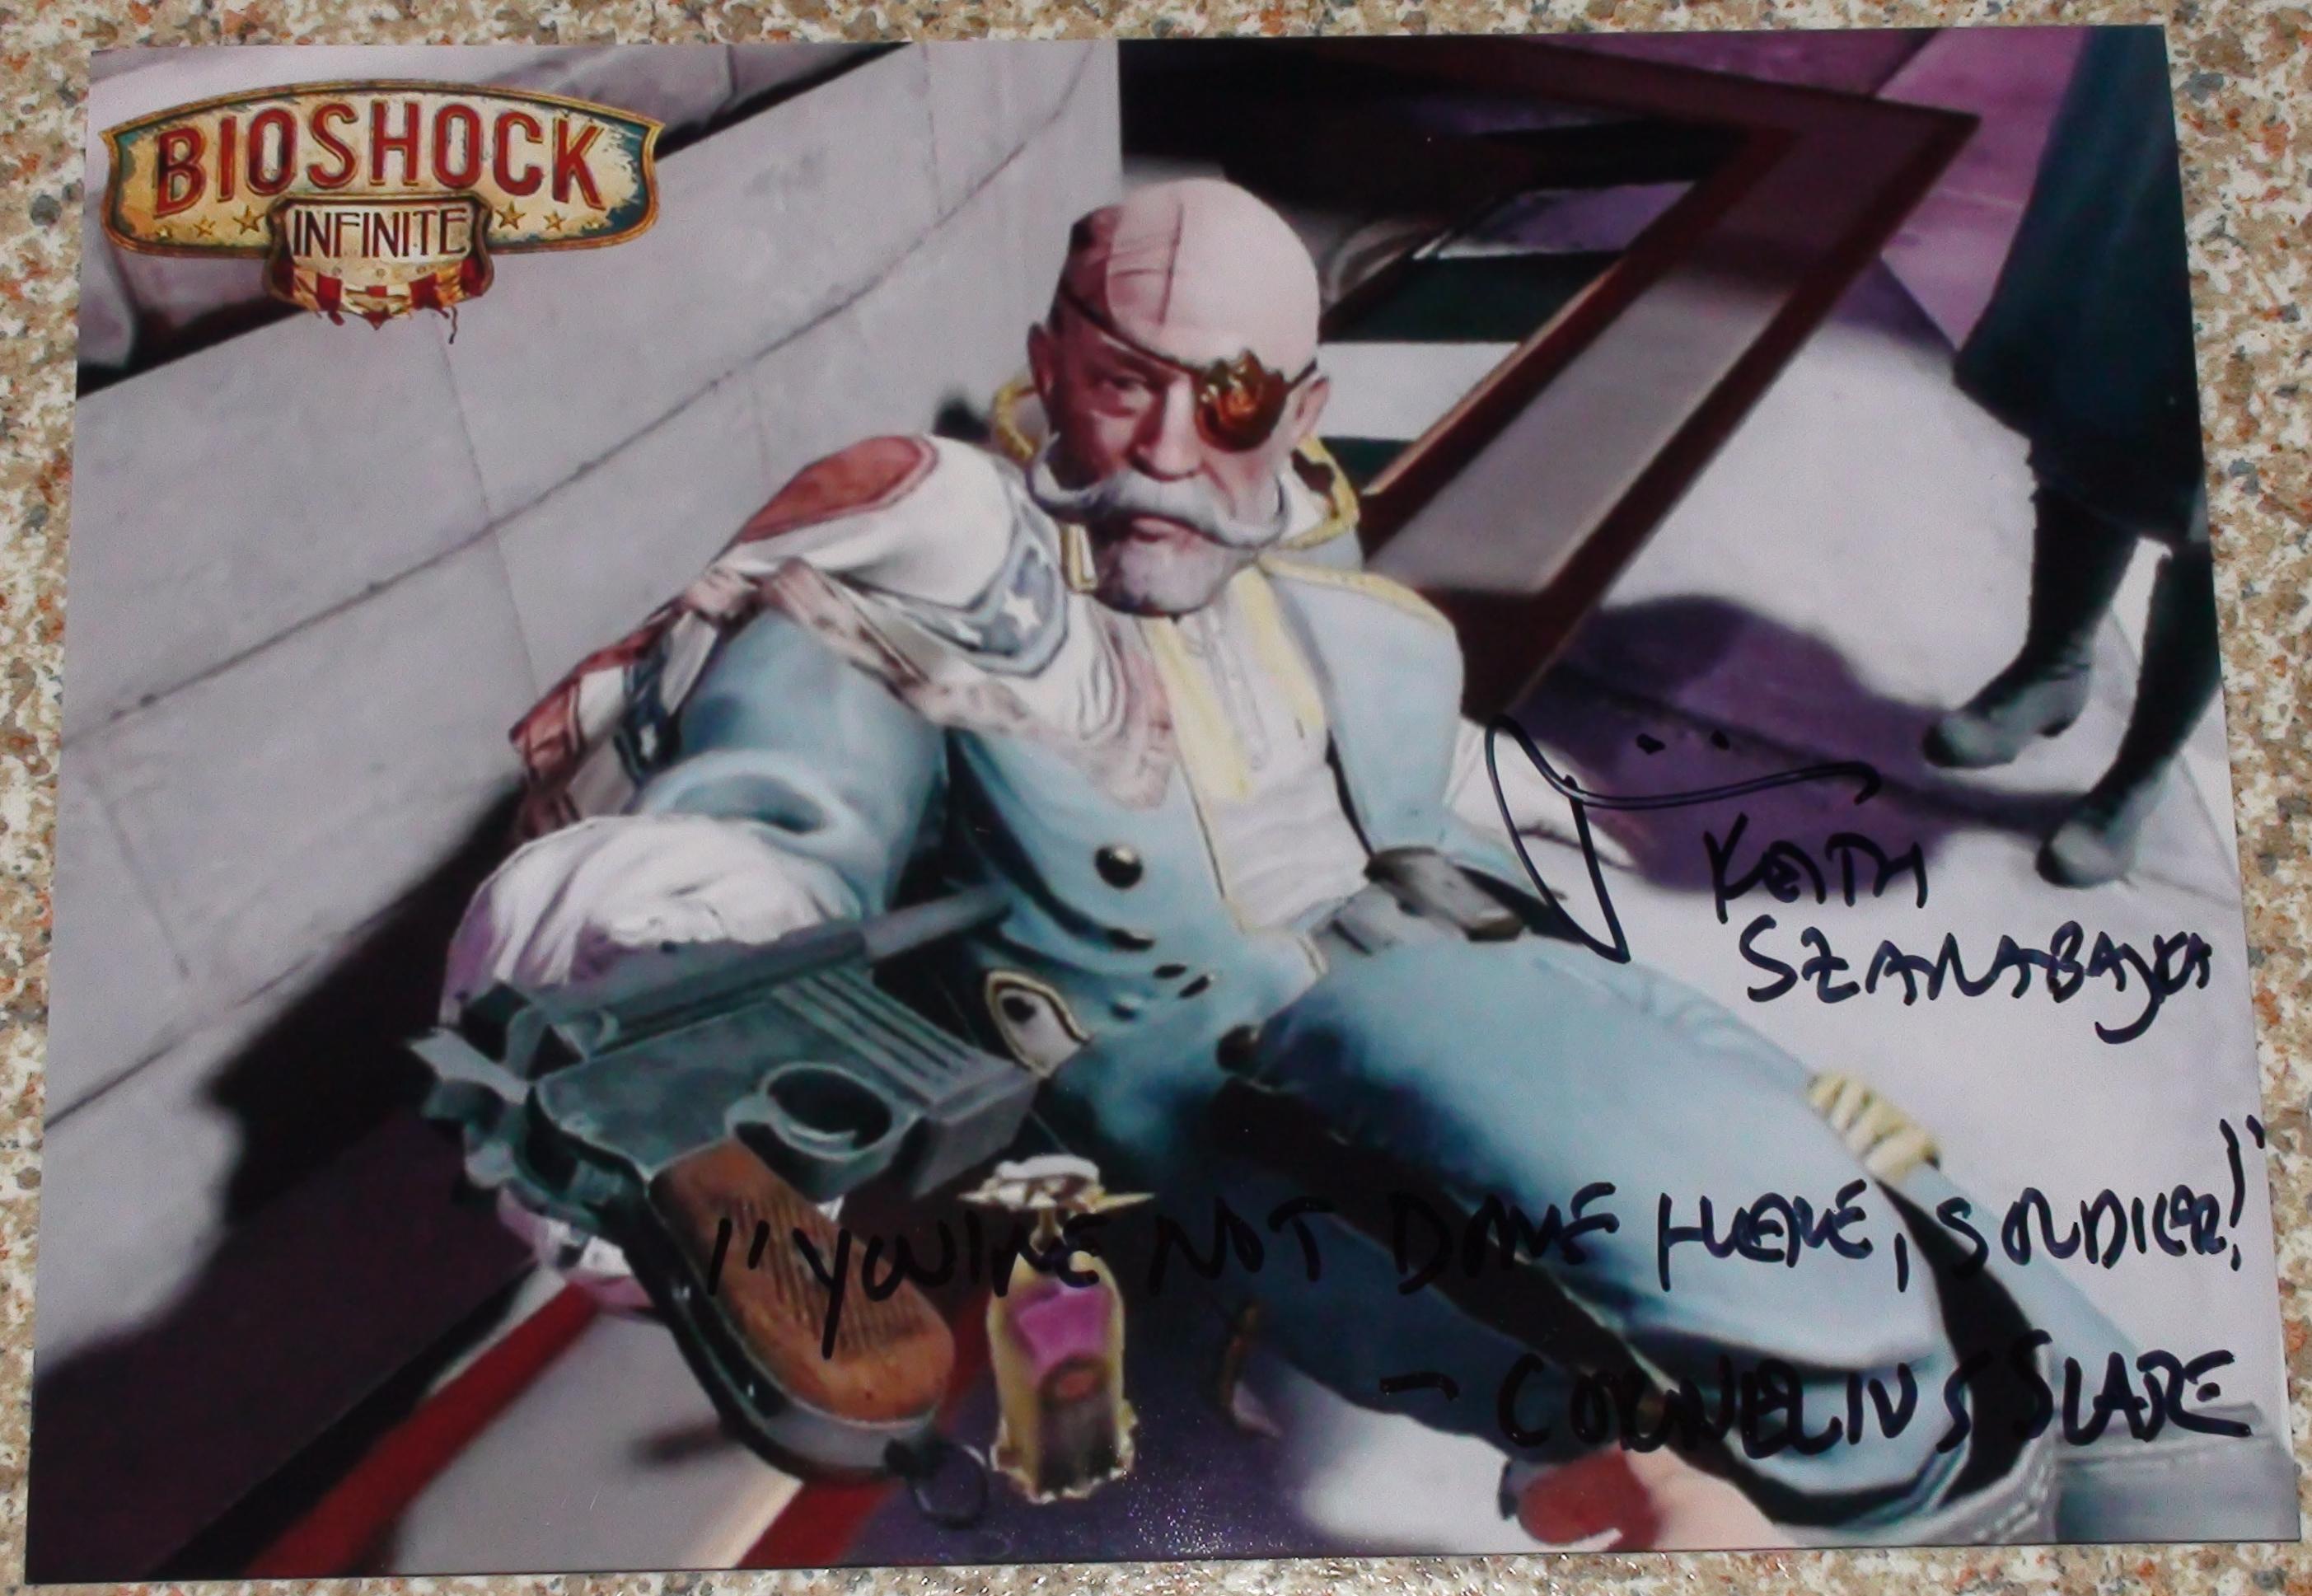 Bioshock Infinite - Keith Szarabajka